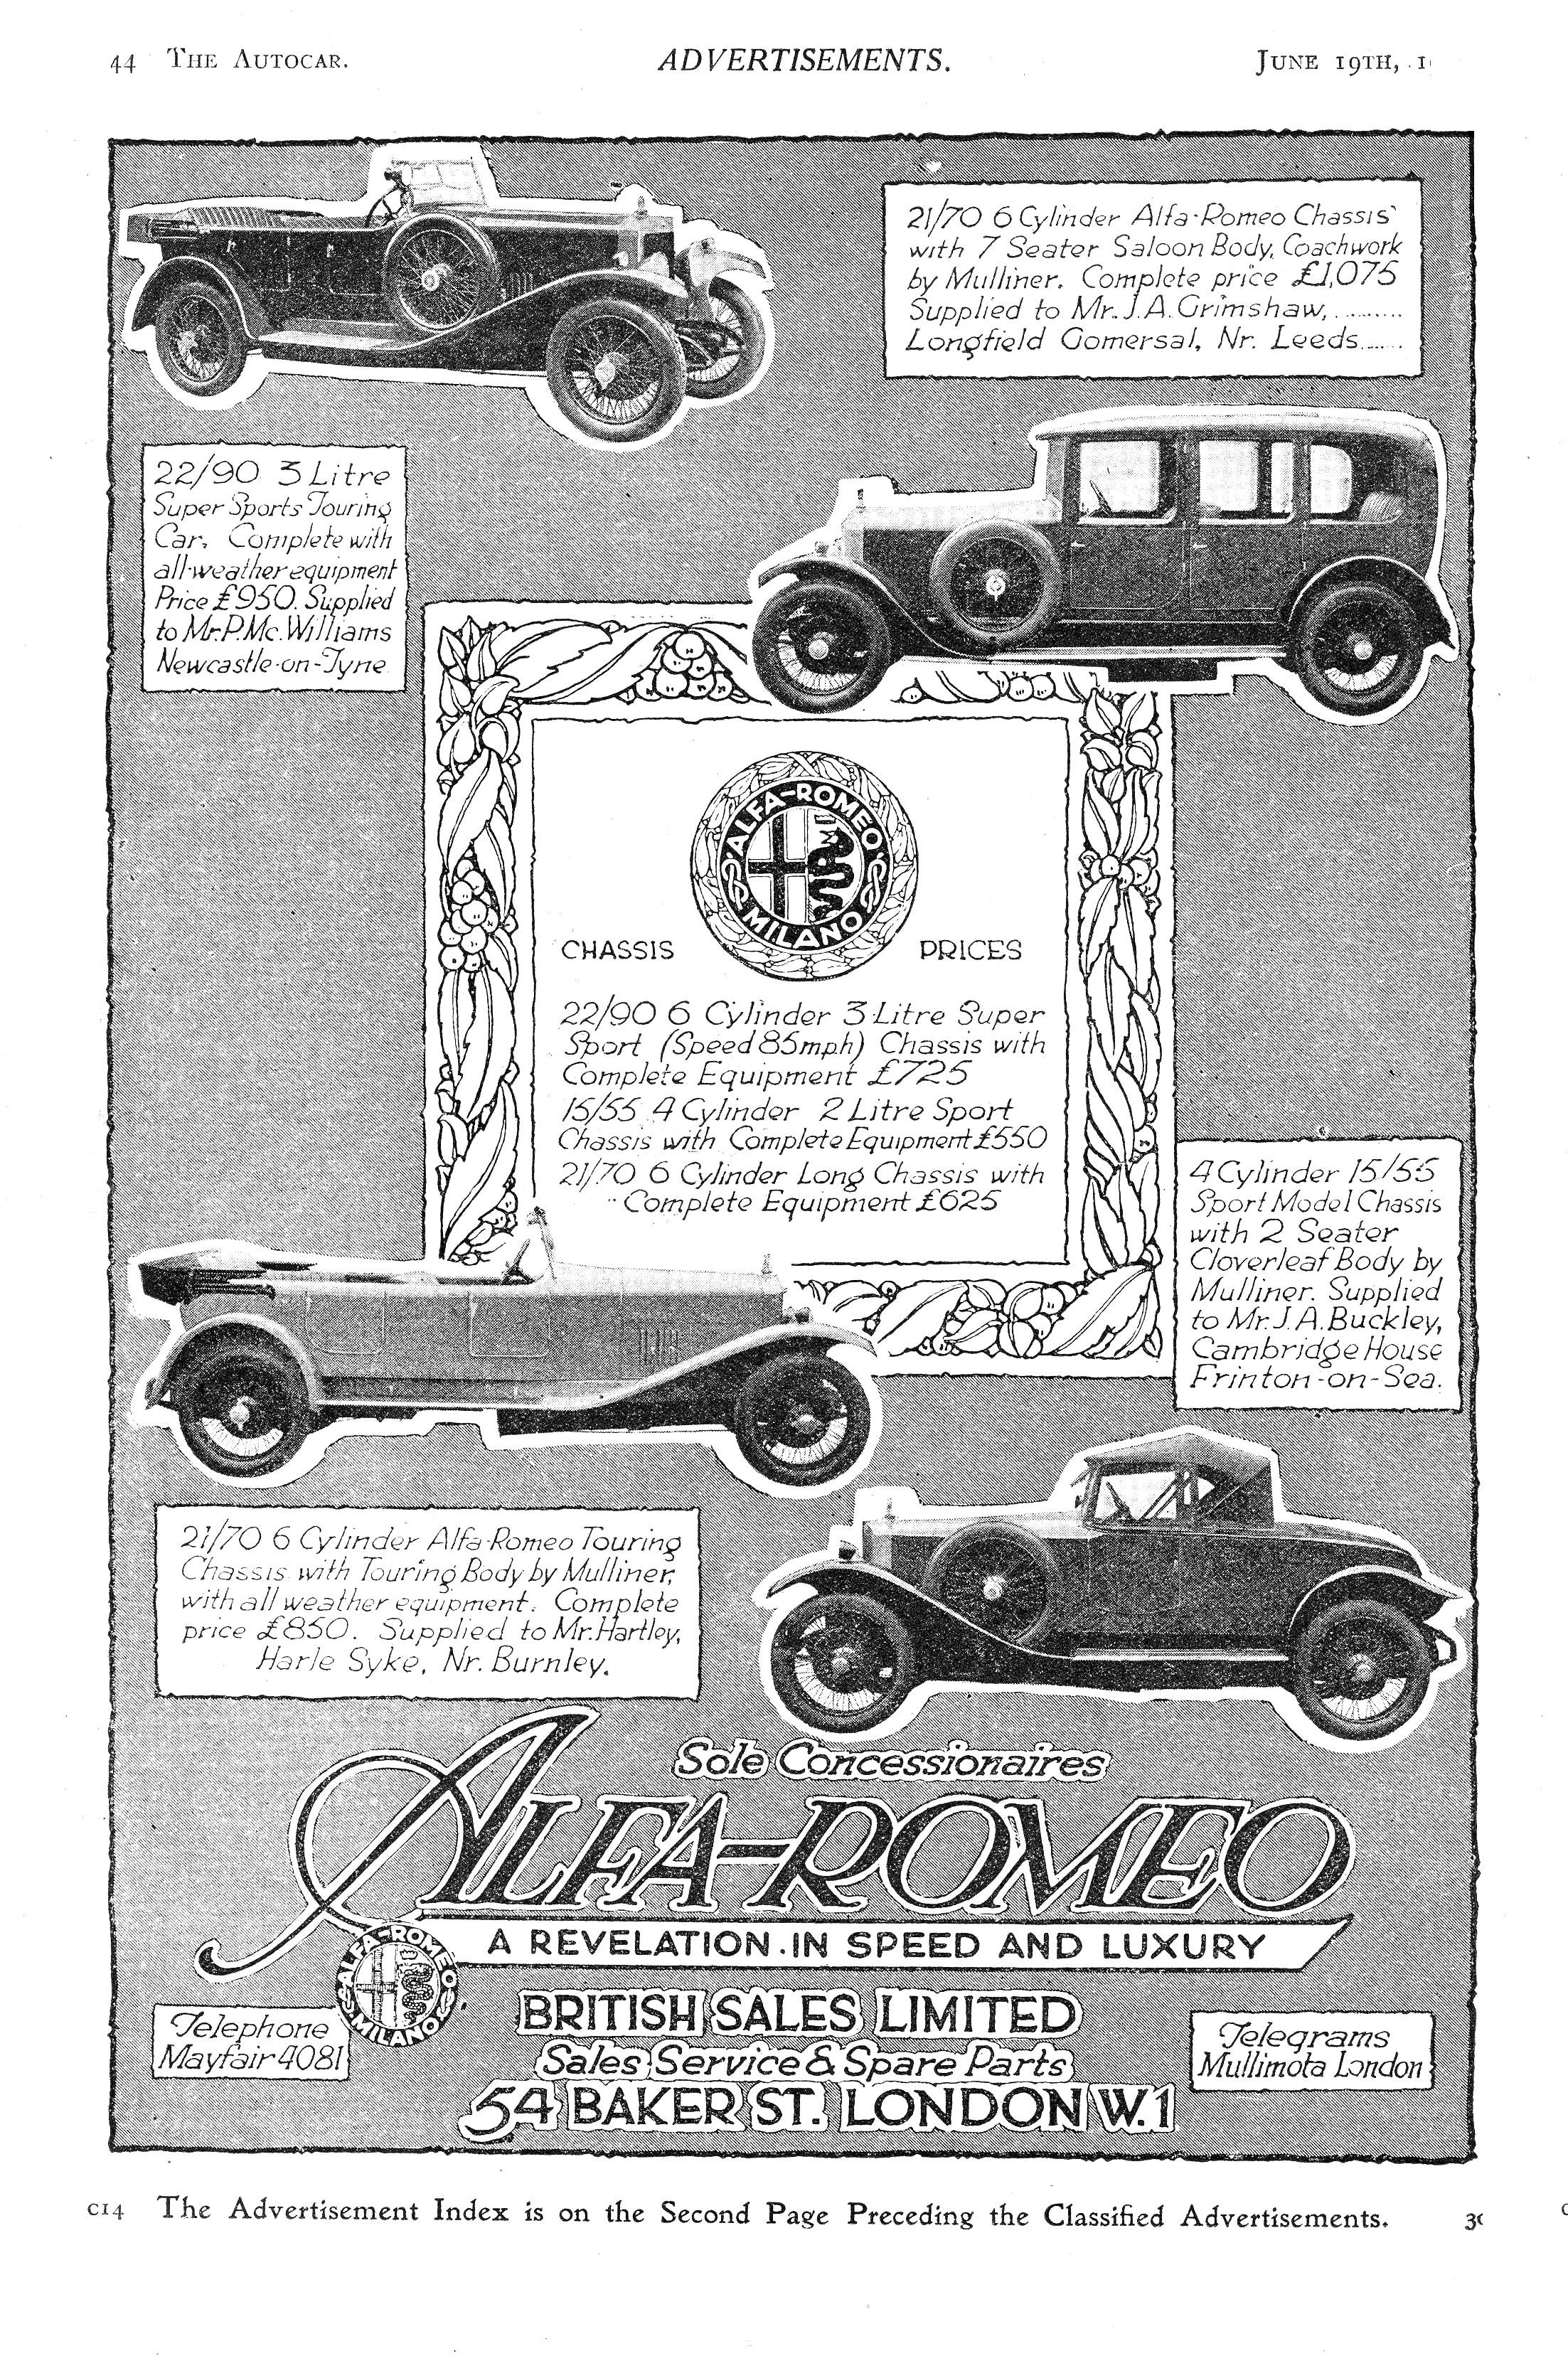 Alfa Romeo Car Autocar Advert 1930s